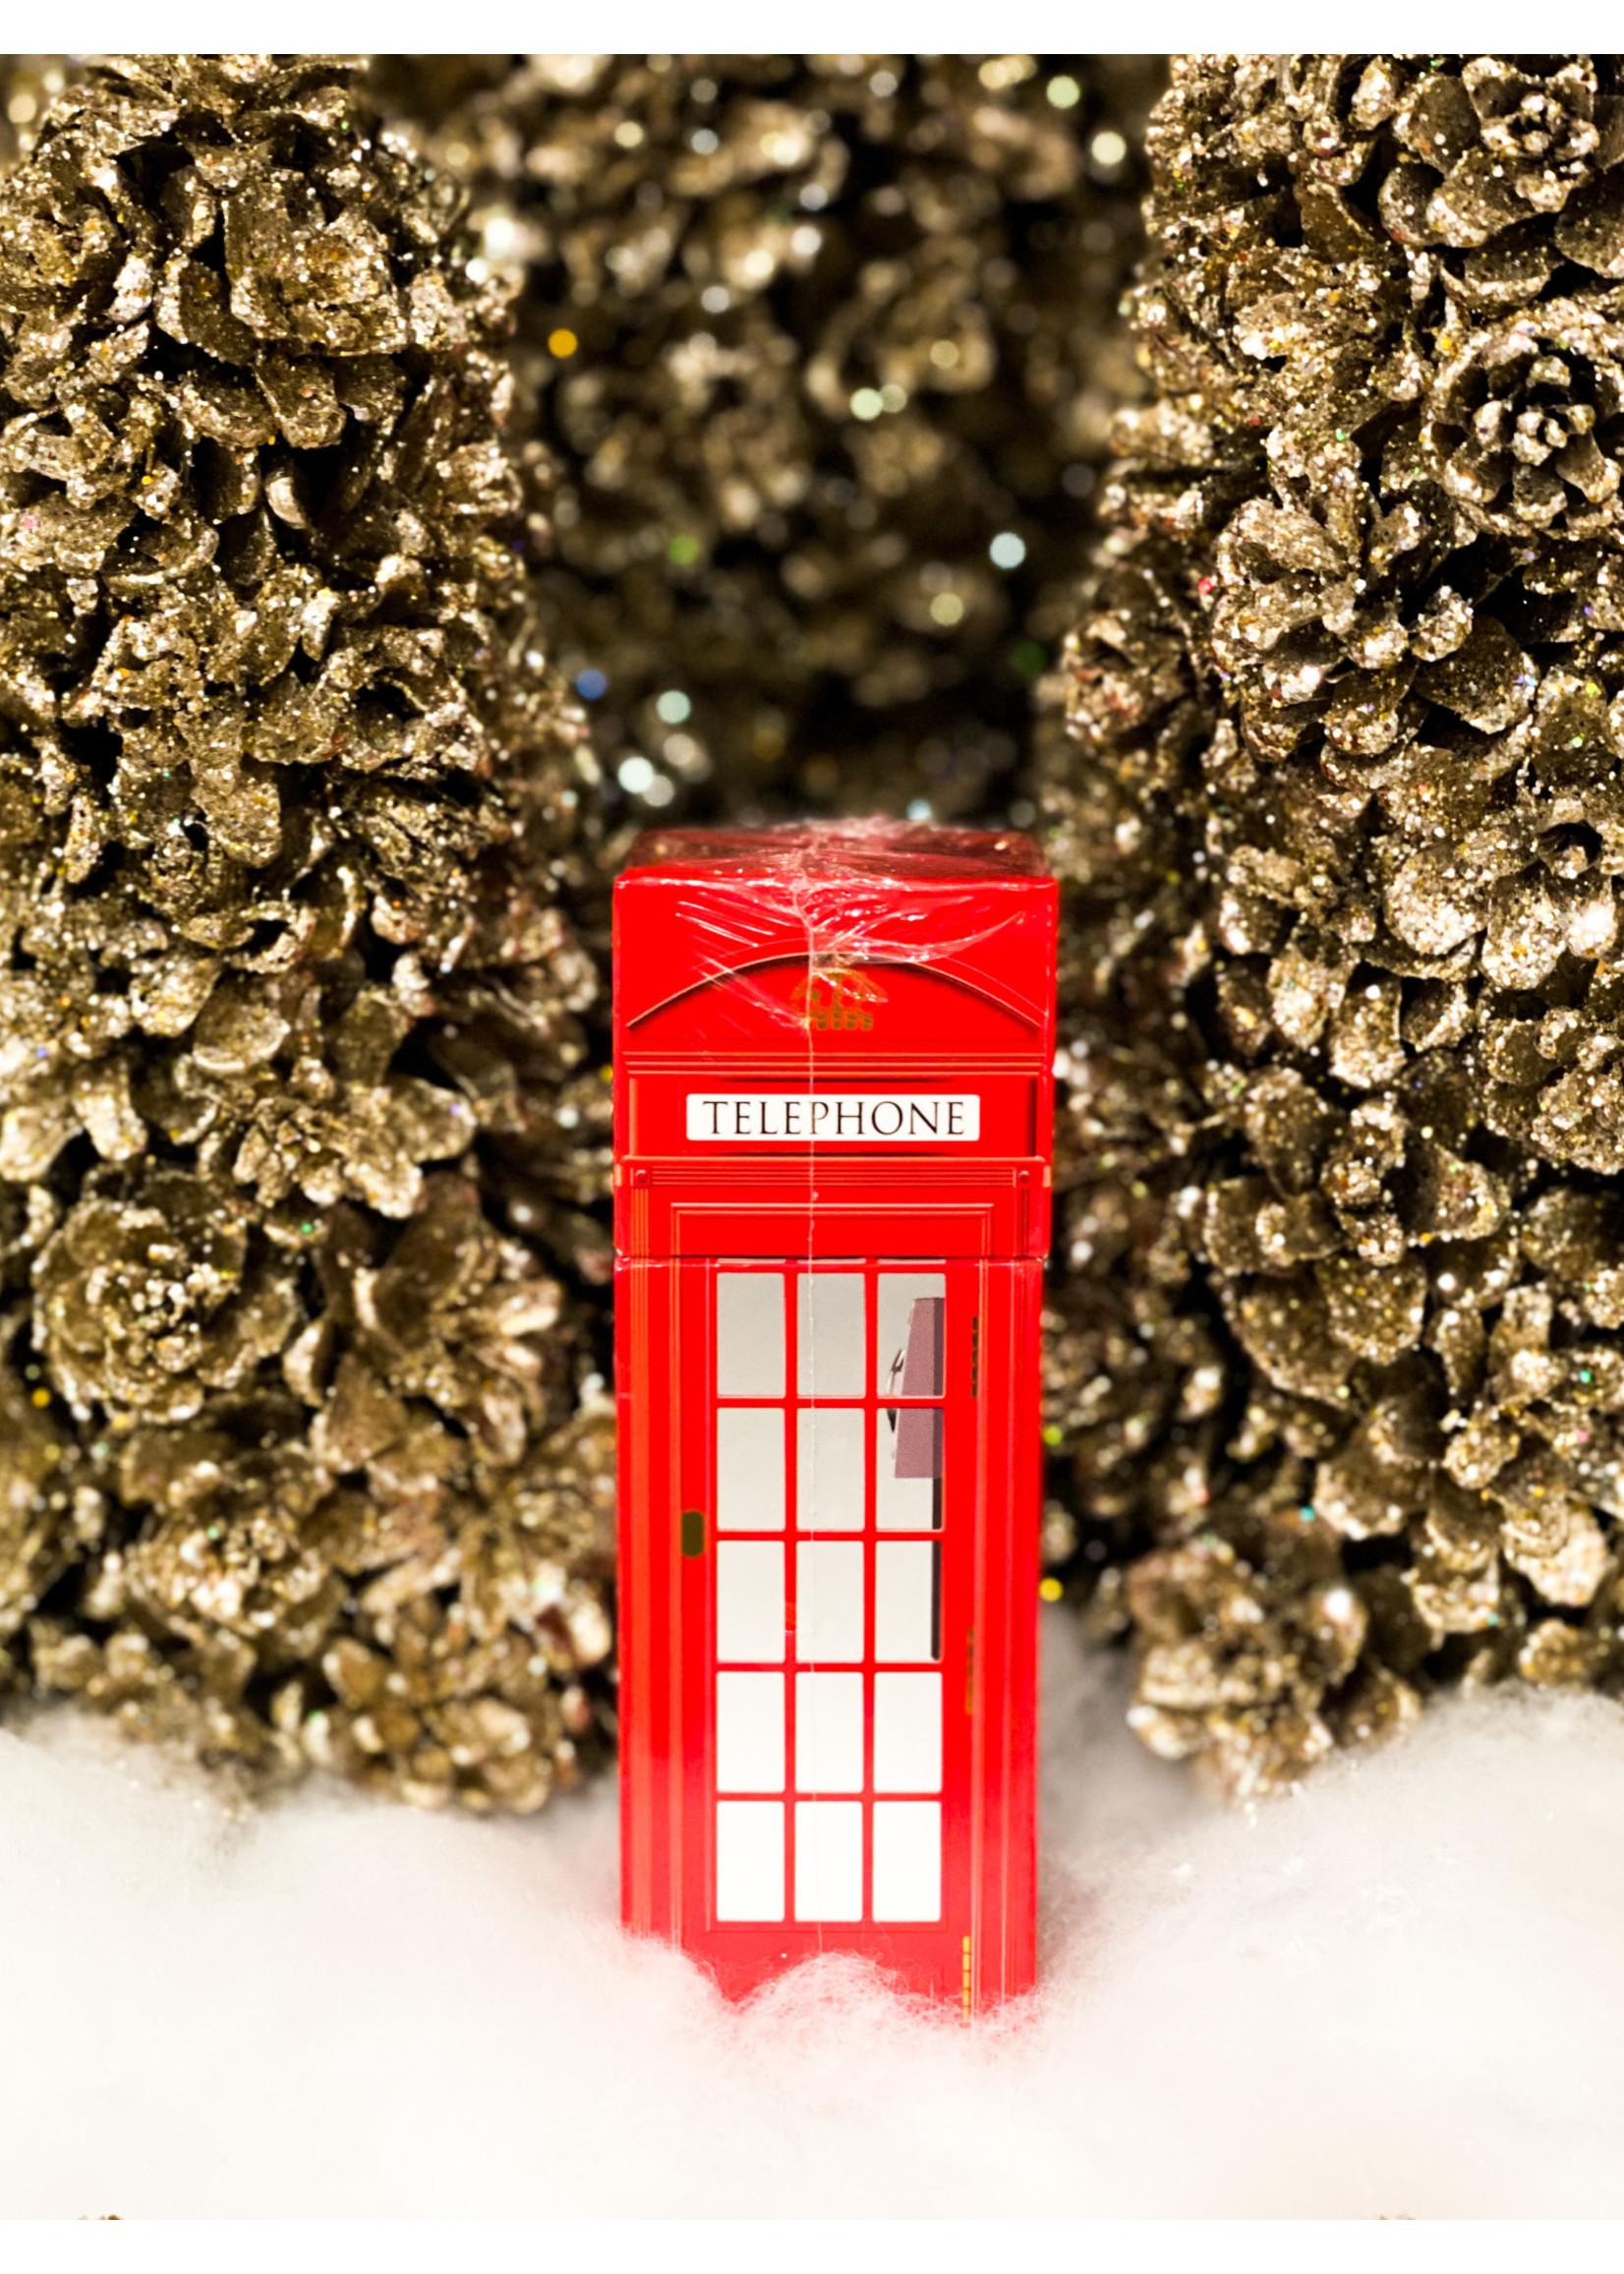 Matchbox Square - Telephone Box - Small